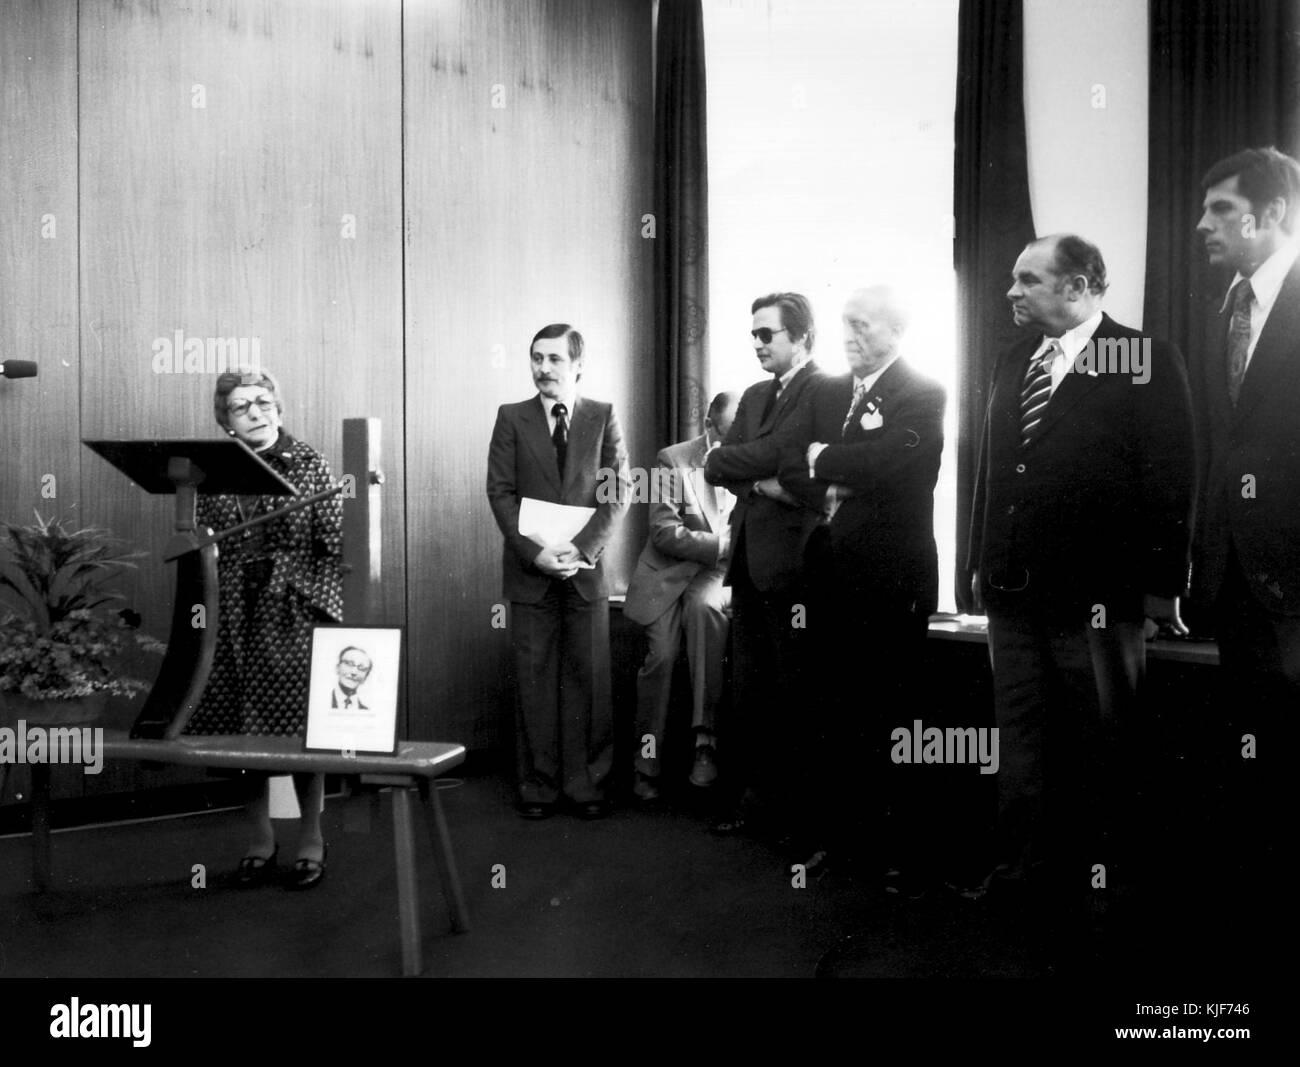 Goldene Pelzmotte 1976, Gerd Kursawe, Hans Quaet Faslem, Martin von Schachtmeyer (07) - Stock Image